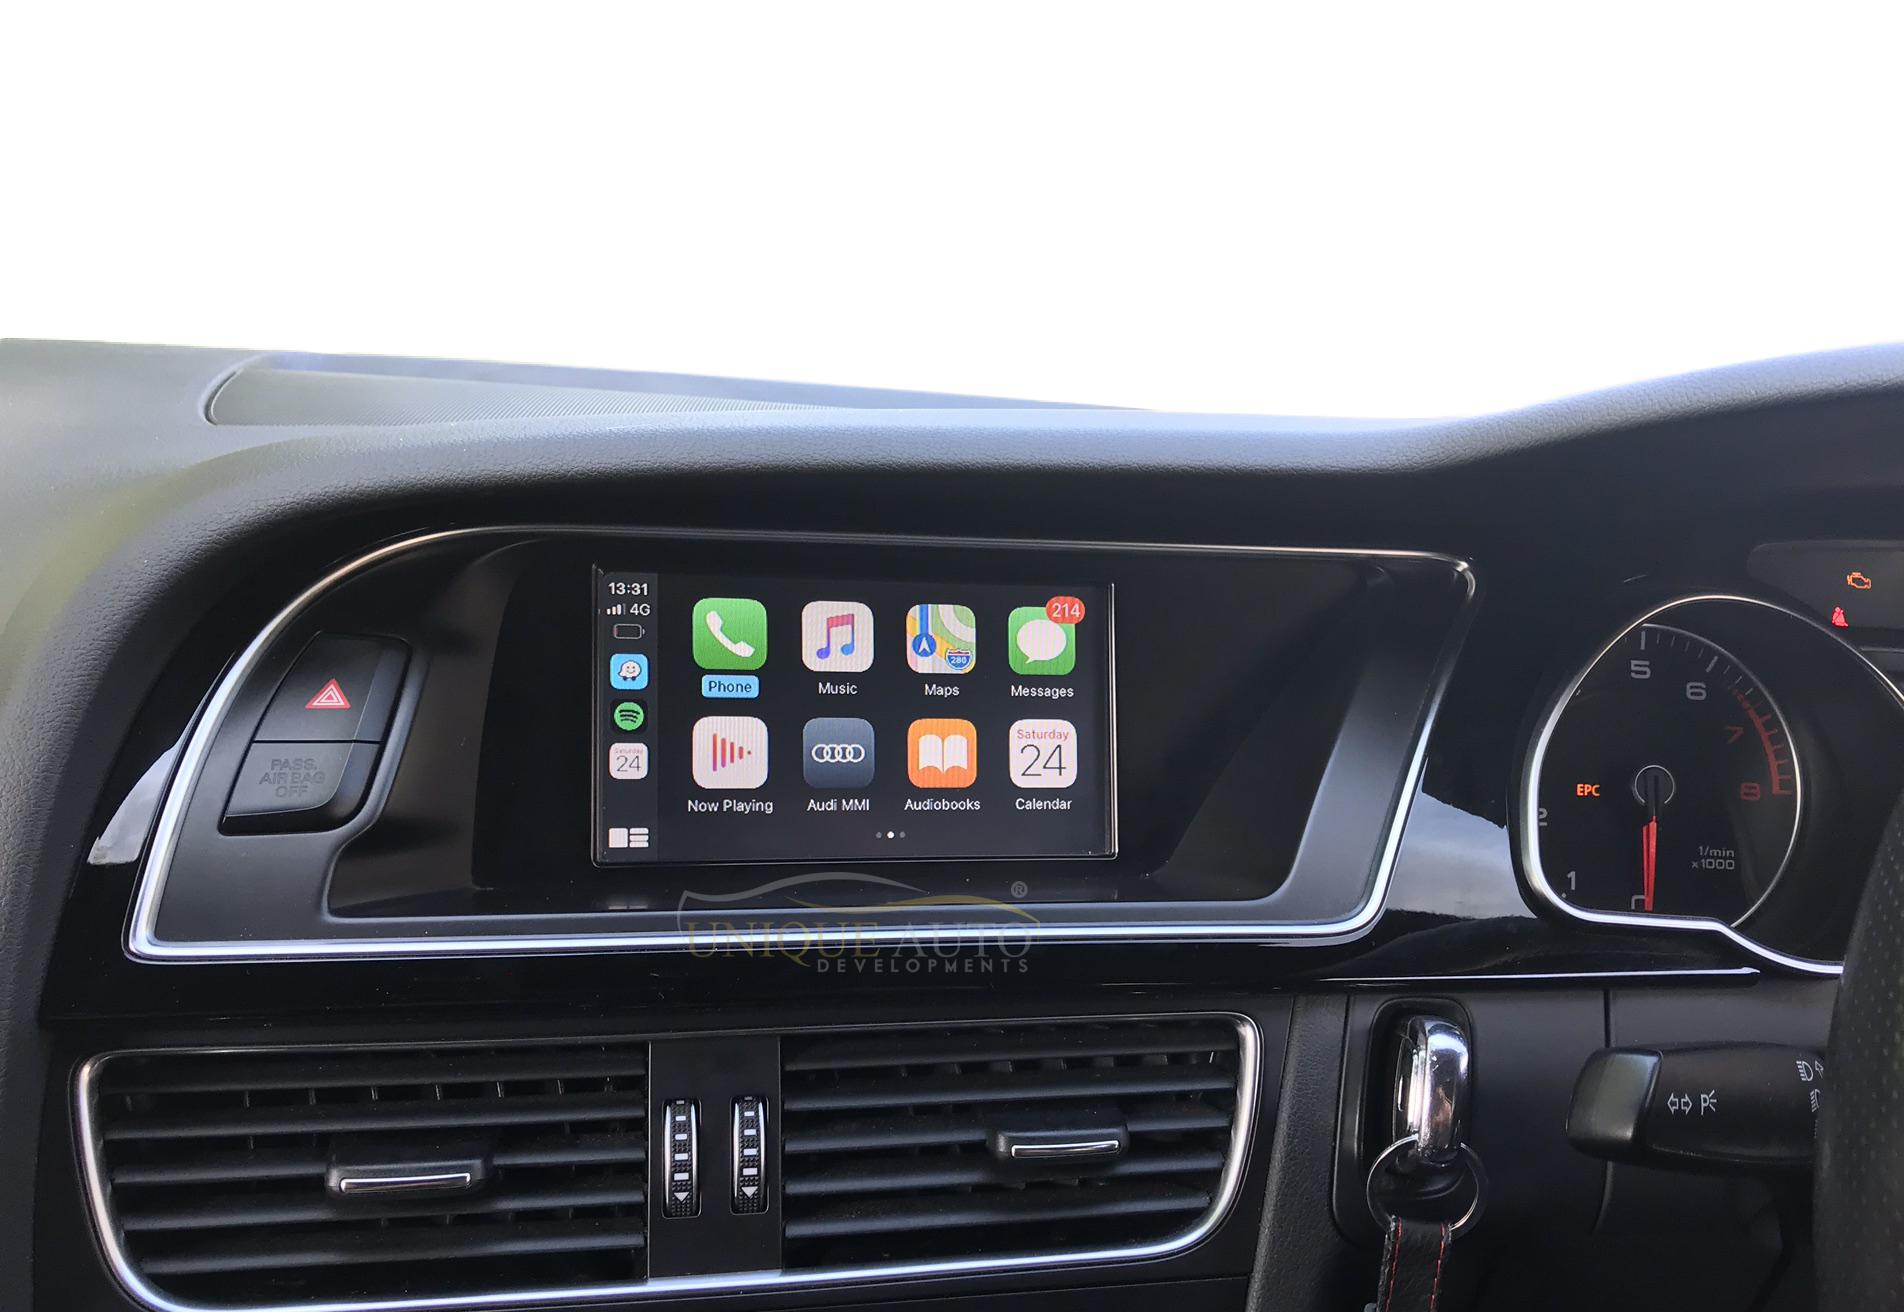 Wireless Apple Carplay Android Auto Retrofit Kit Audi A4 A5 B8 2008 2016 Unique Auto Developments